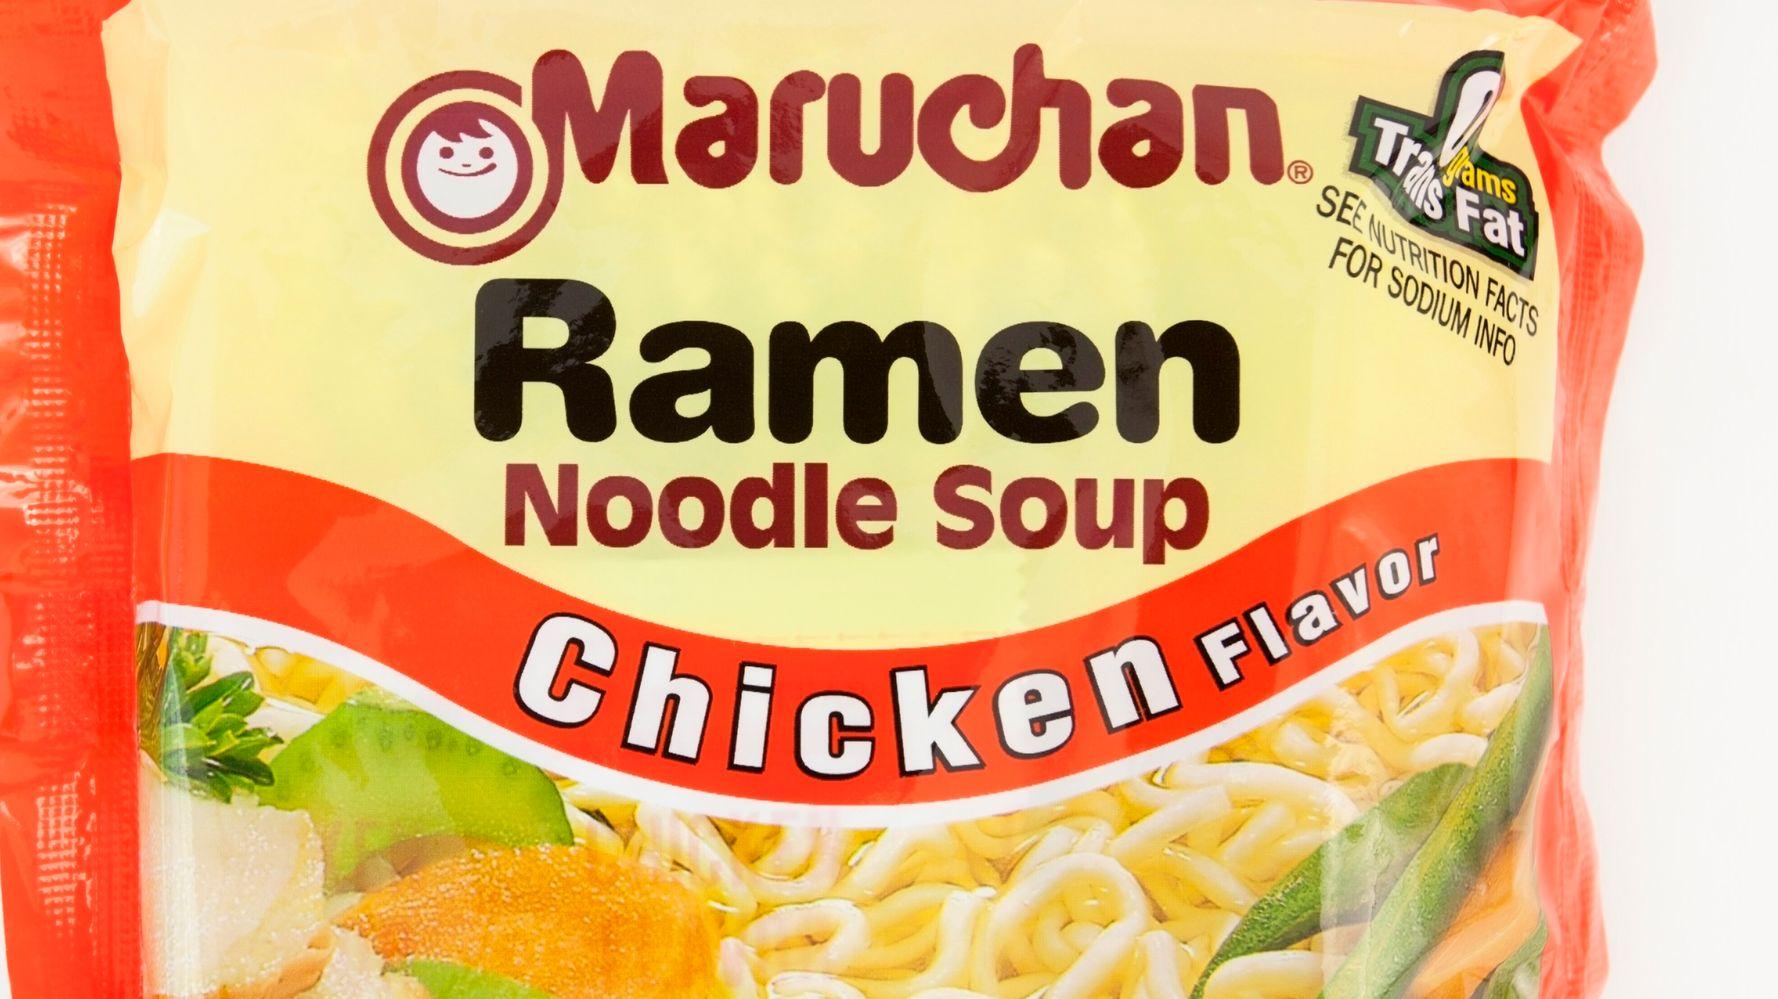 Coronavirus Outbreak Hits One Of Maruchan's Biggest U.S. Ramen Noodle Factories 1